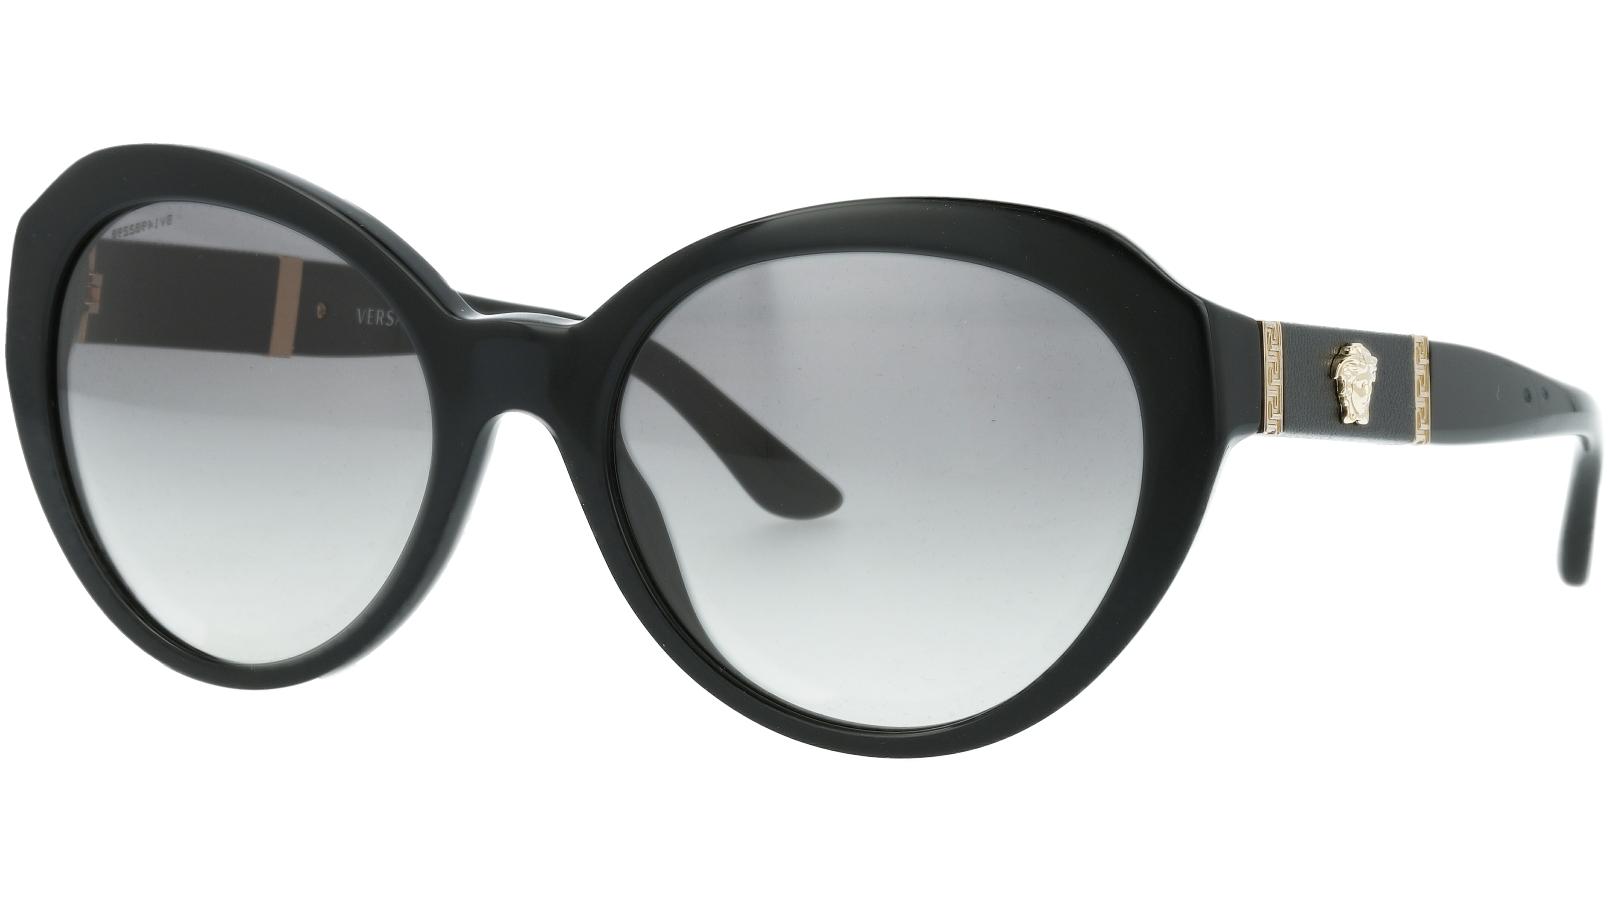 Versace VE4306Q GB1/11 56 Black Sunglasses